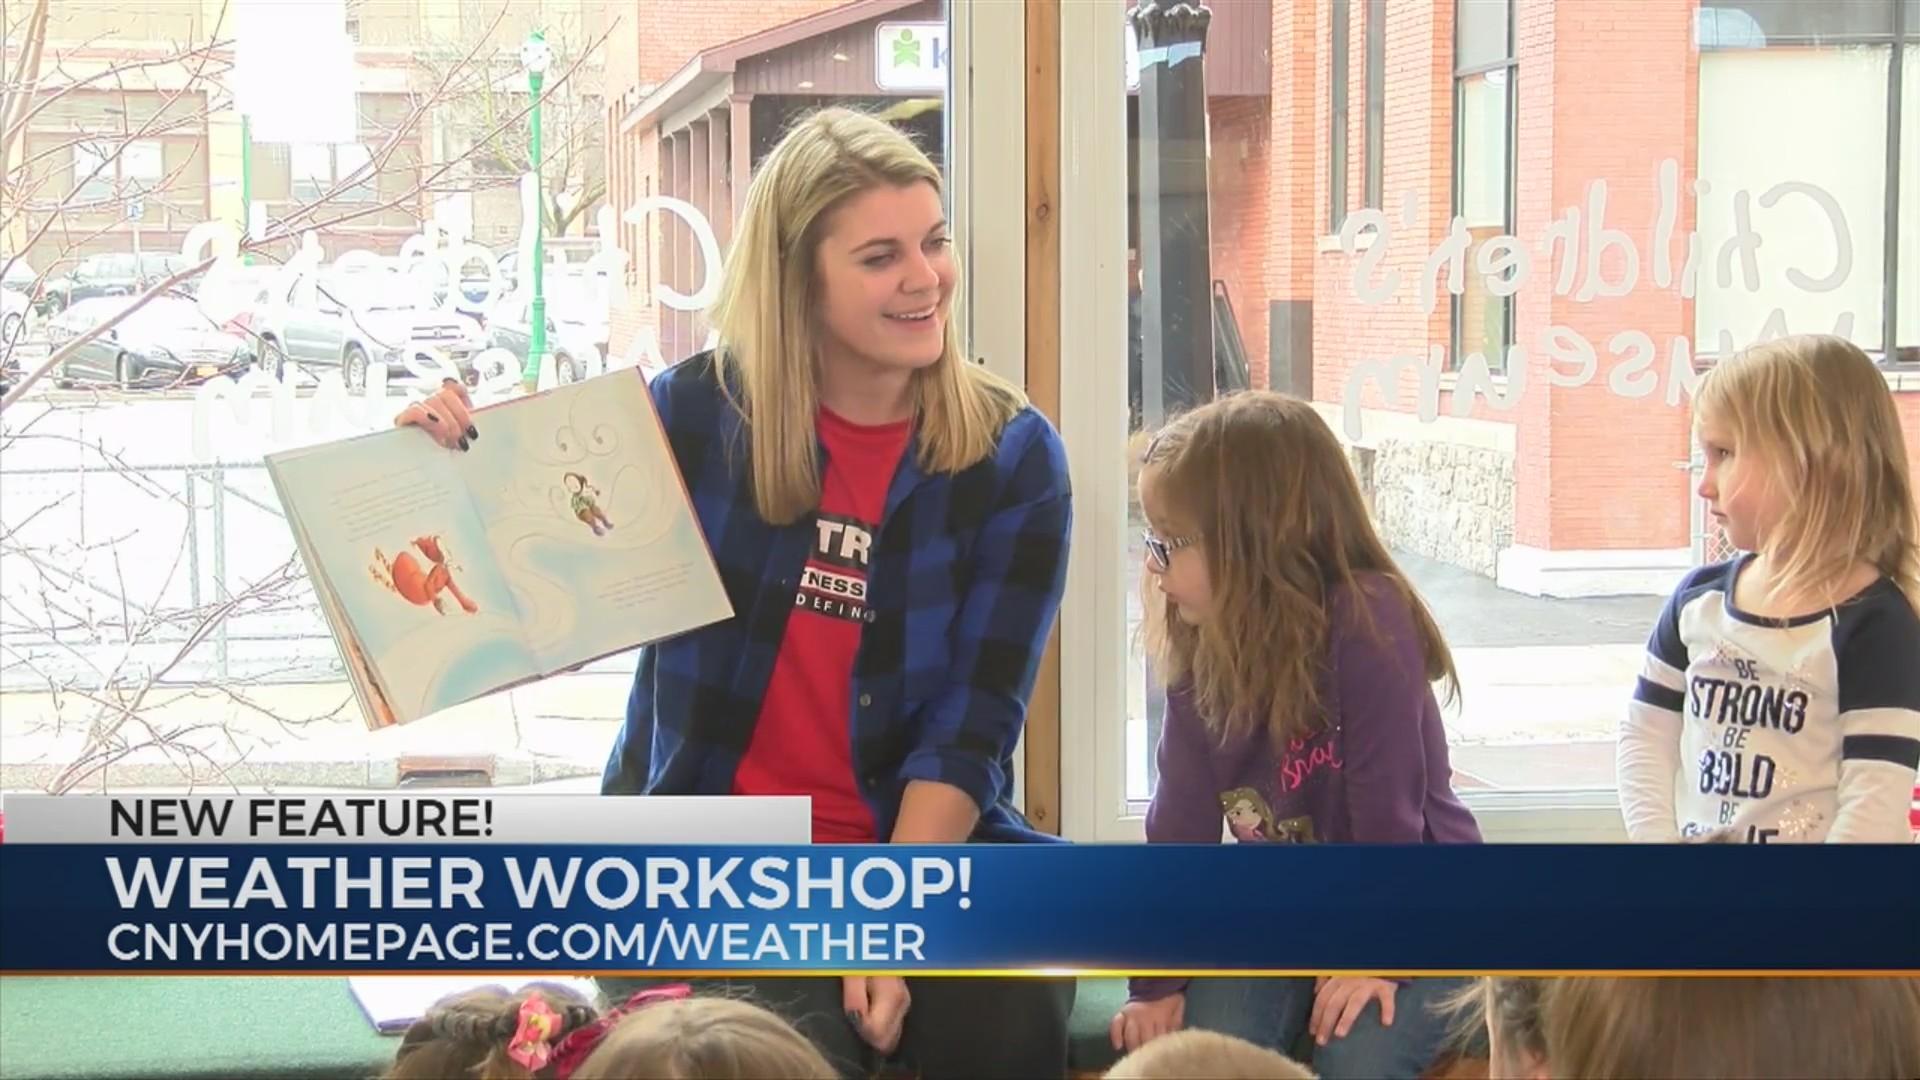 Weather Workshop #1